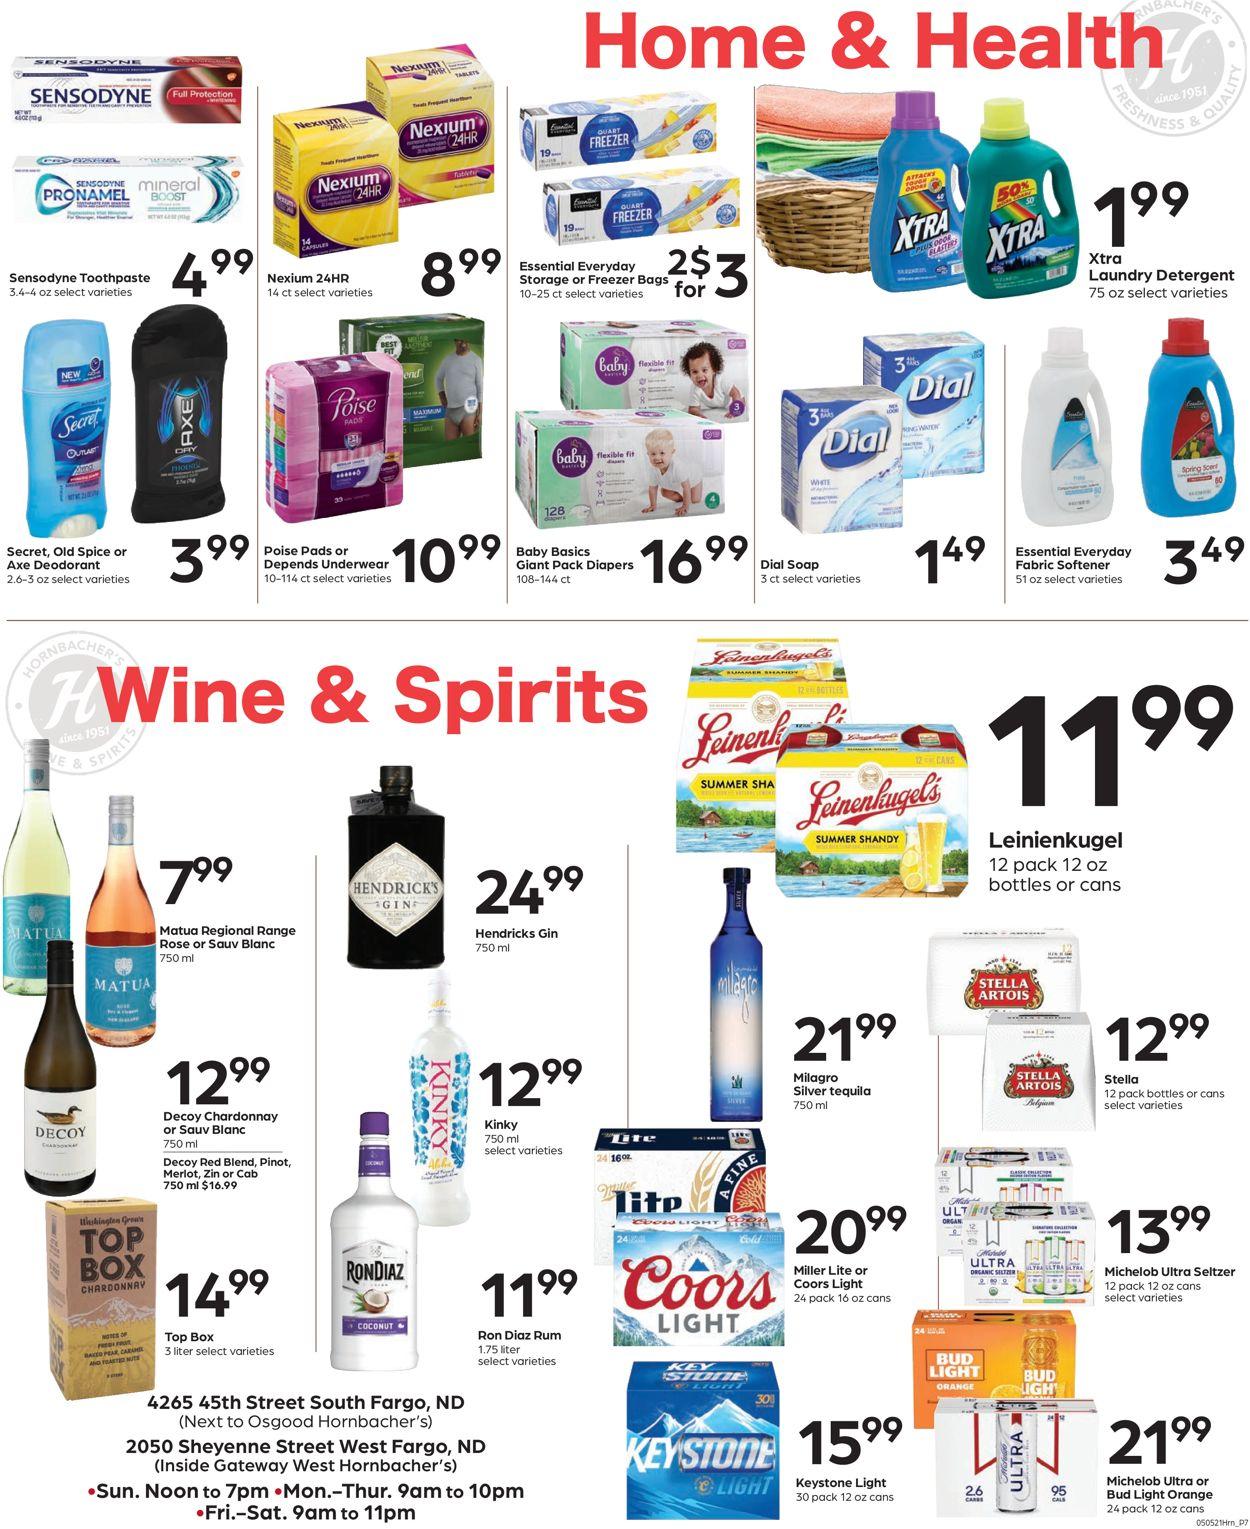 Hornbacher's Weekly Ad Circular - valid 05/05-05/11/2021